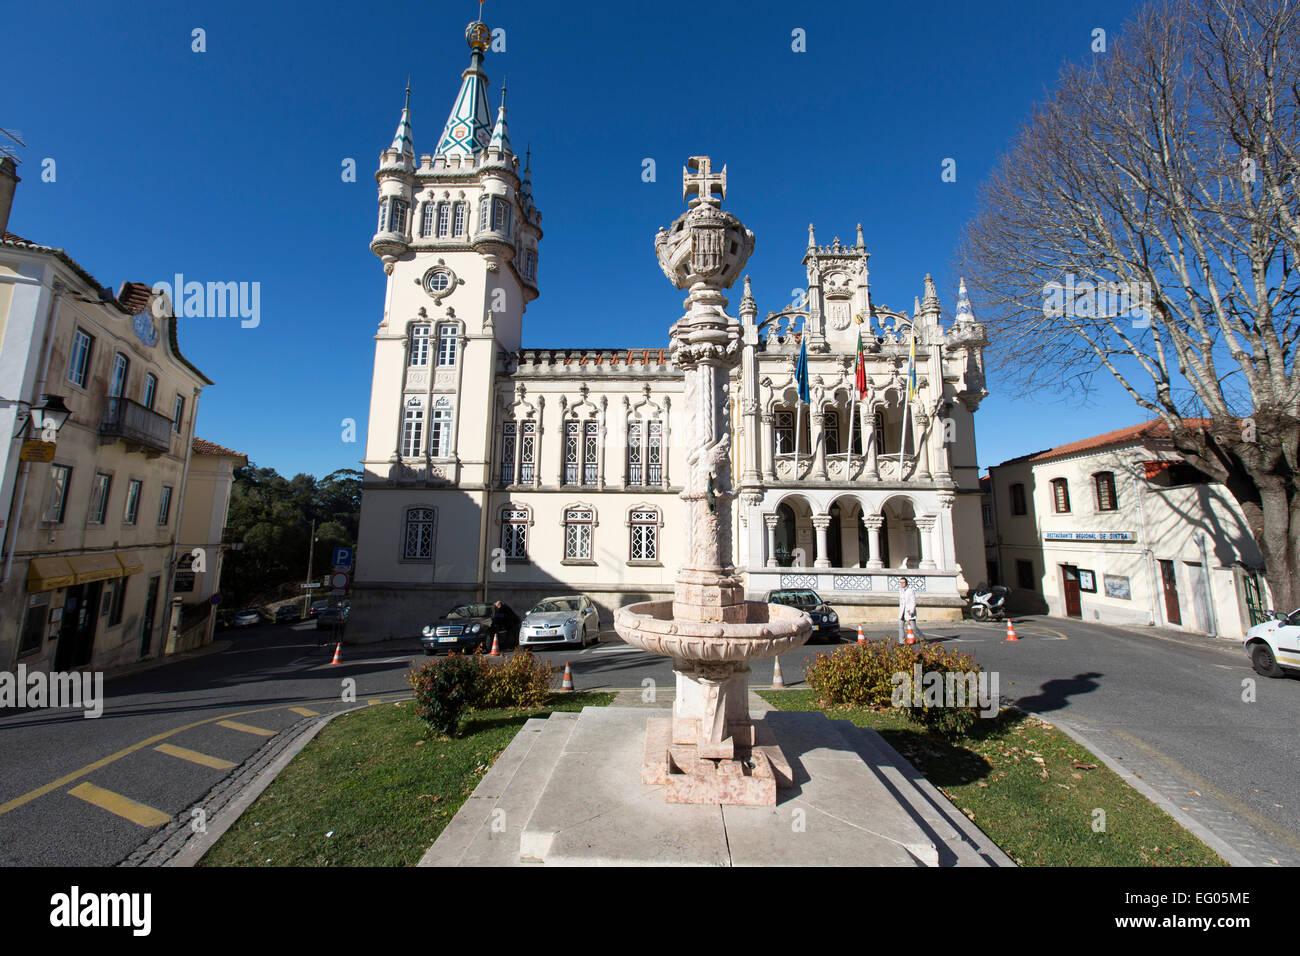 Gothic tower and heraldic column at the Town Hall (Camara Municipal), Sintra - Stock Image